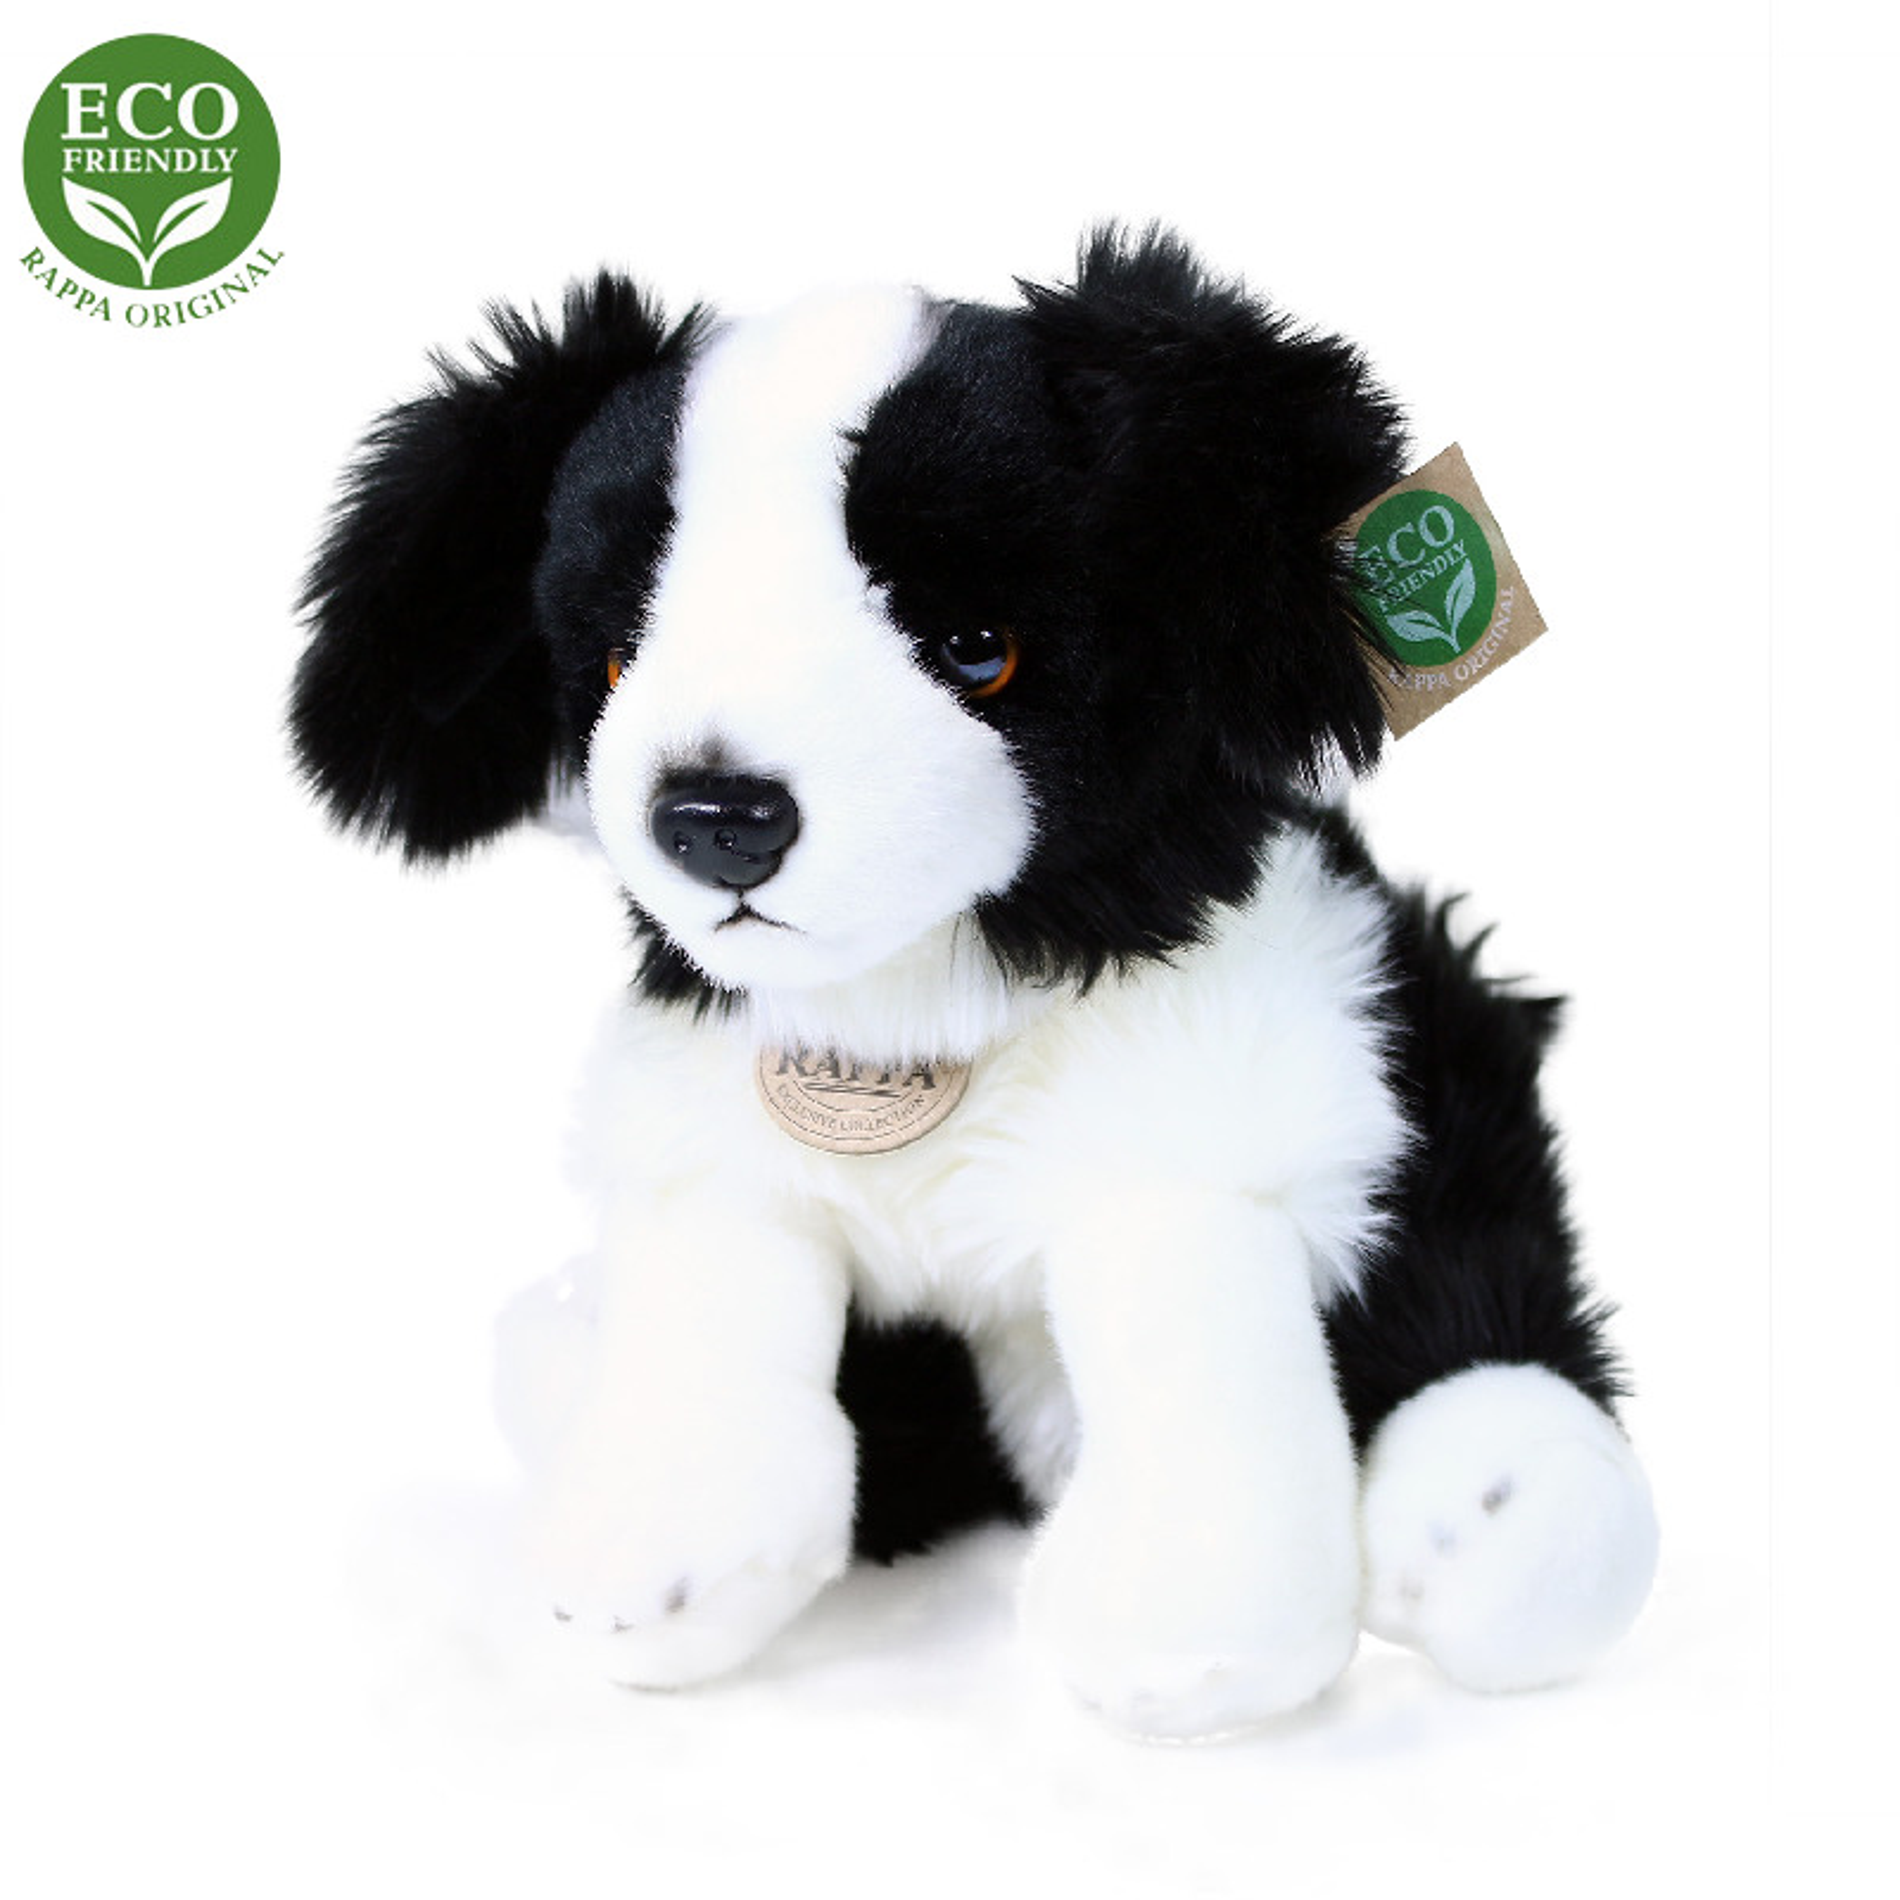 Plyšový pes Border kolie sedící 30 cm ECO-FRIENDLY